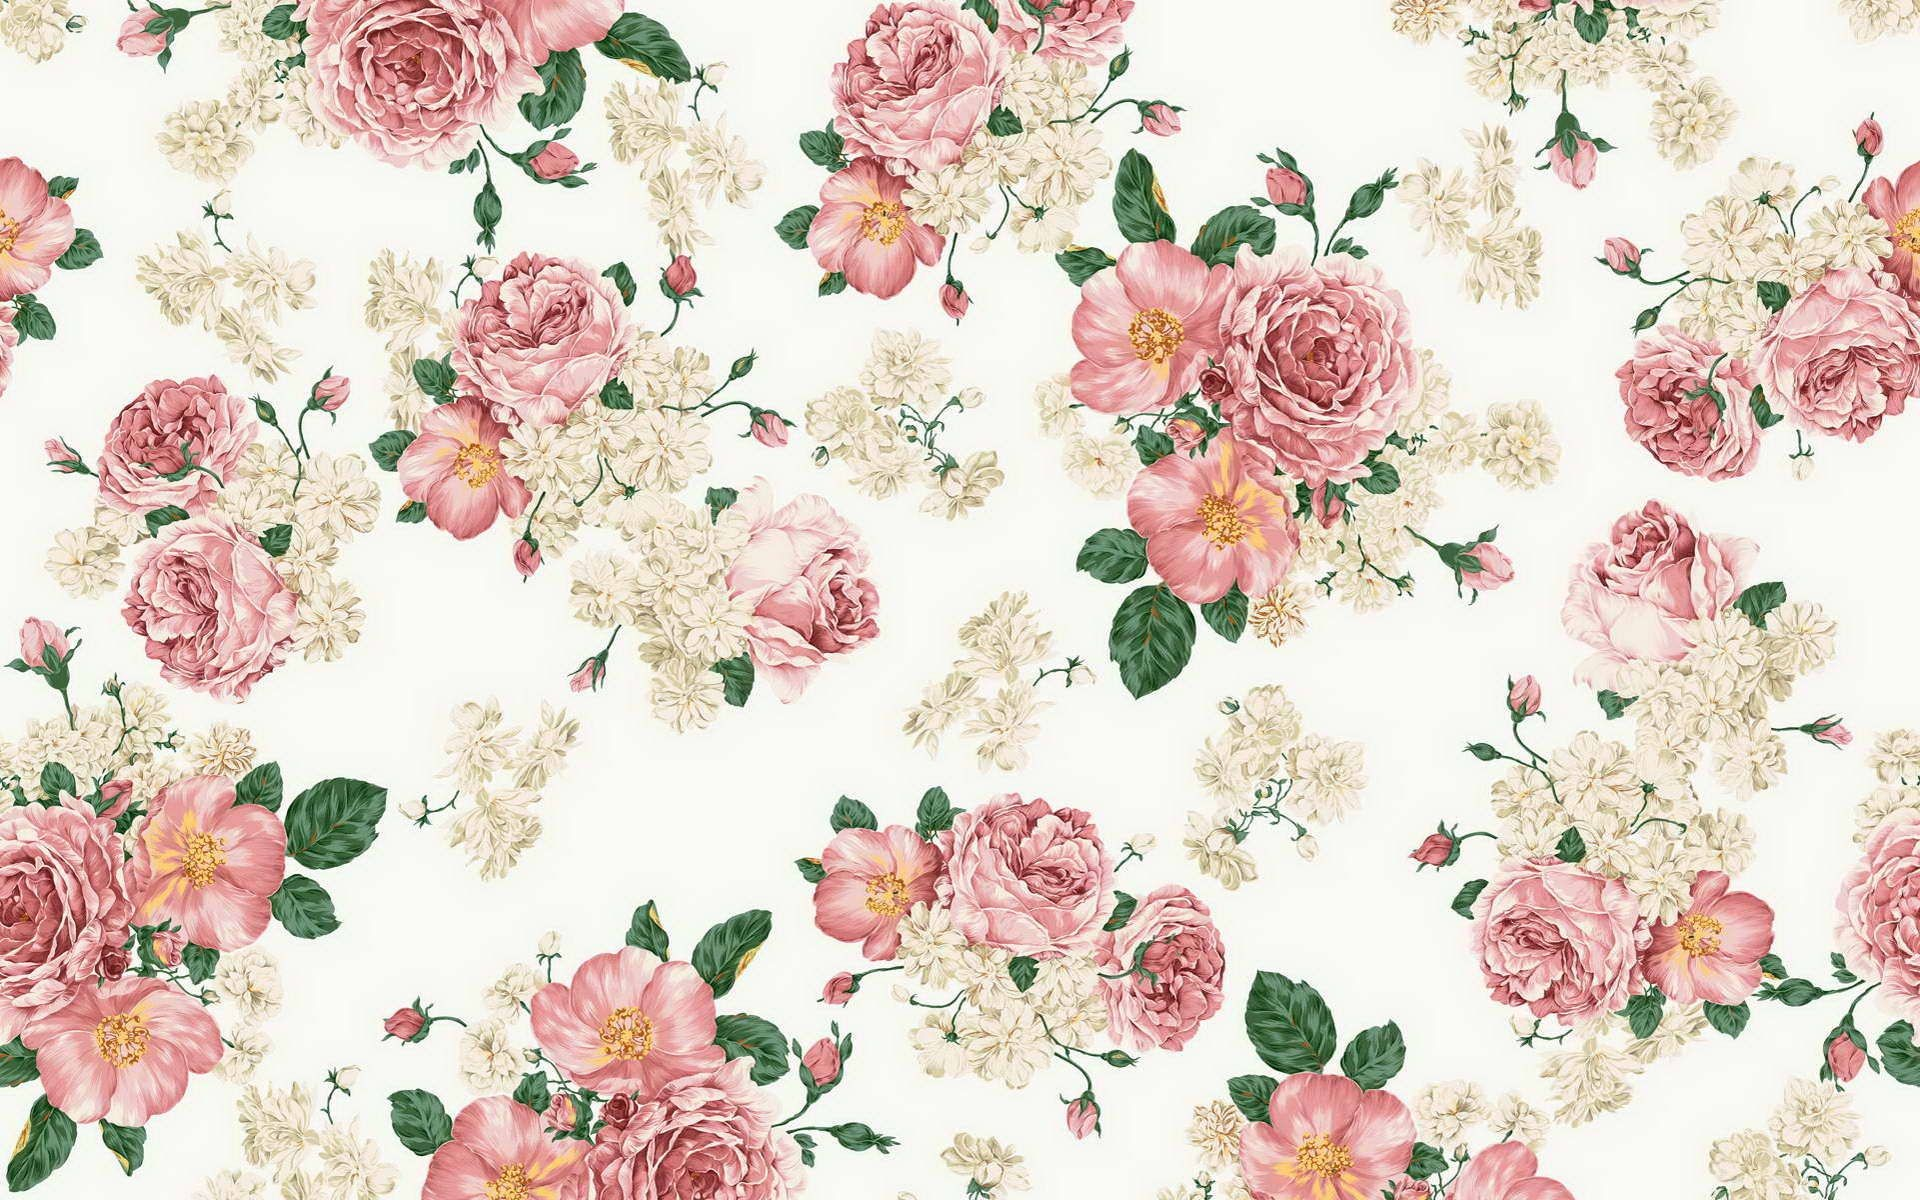 Floral Wallpaper Tumblr Sf Wallpaper